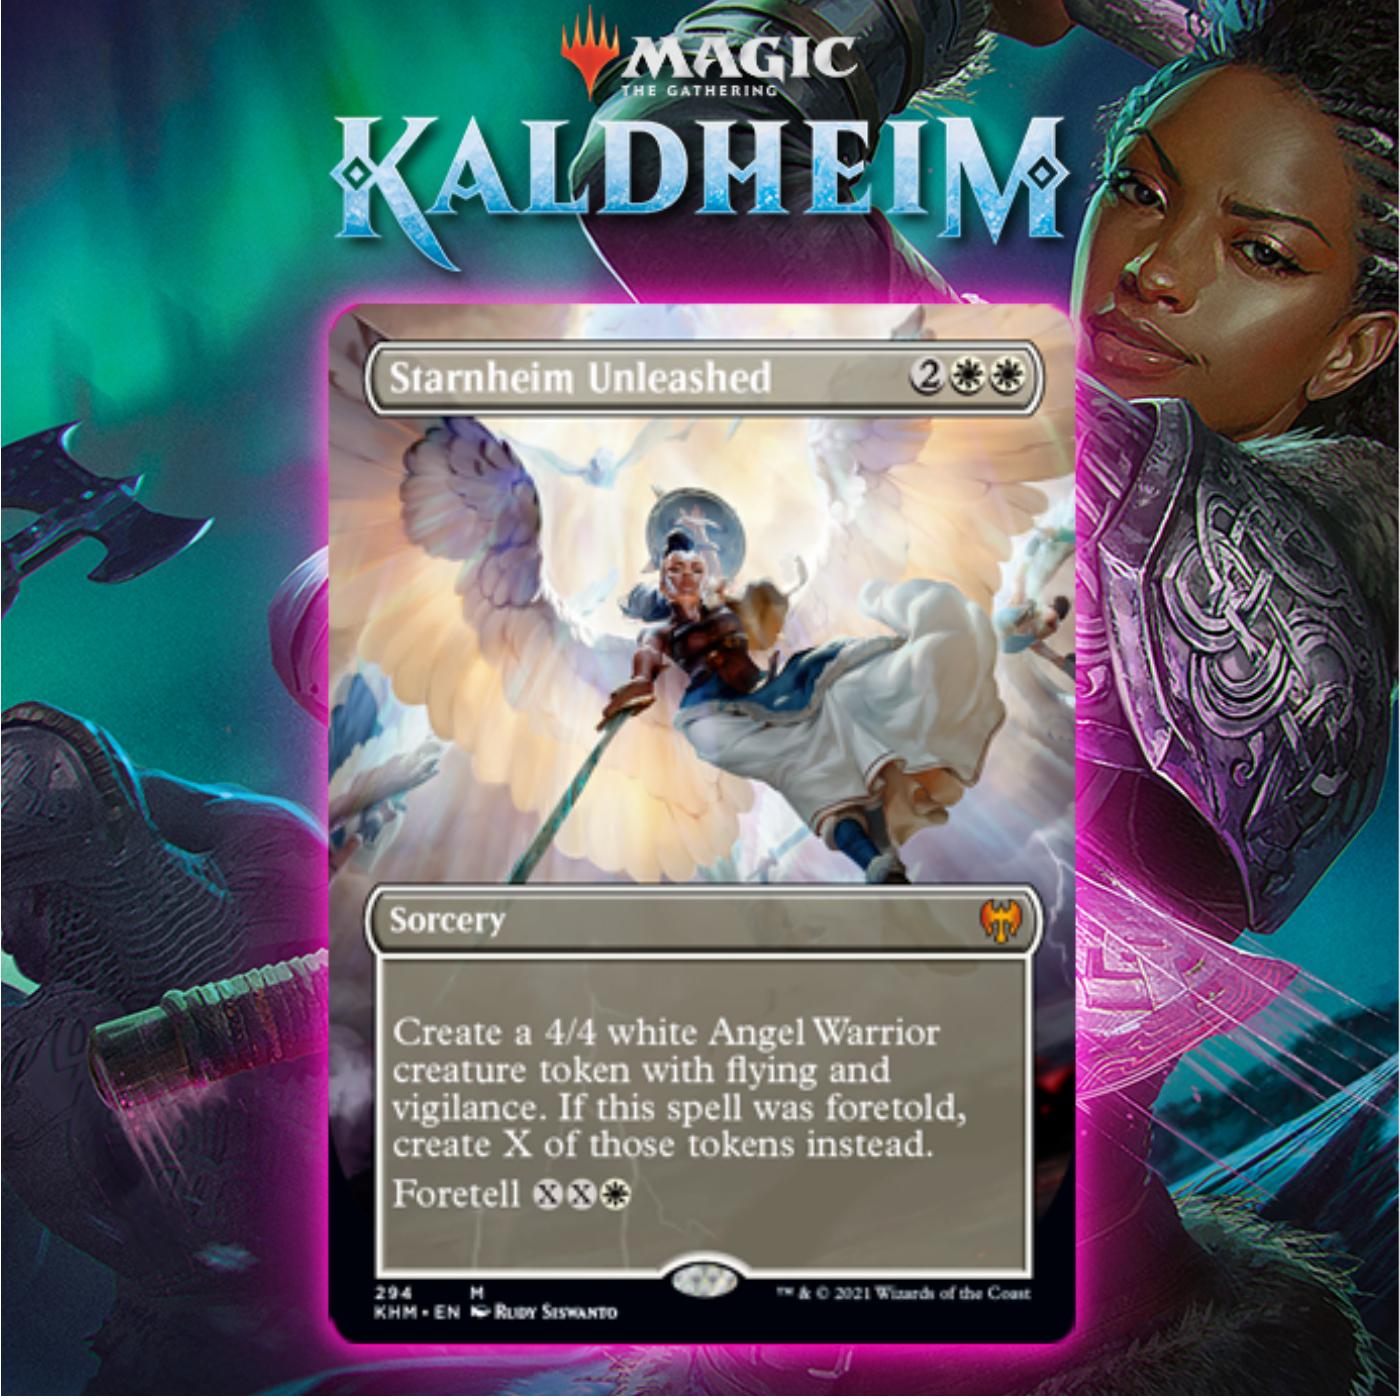 White Gets Angel-Generating Foretold Sorcery In Starnheim Unleashed In Kaldheim